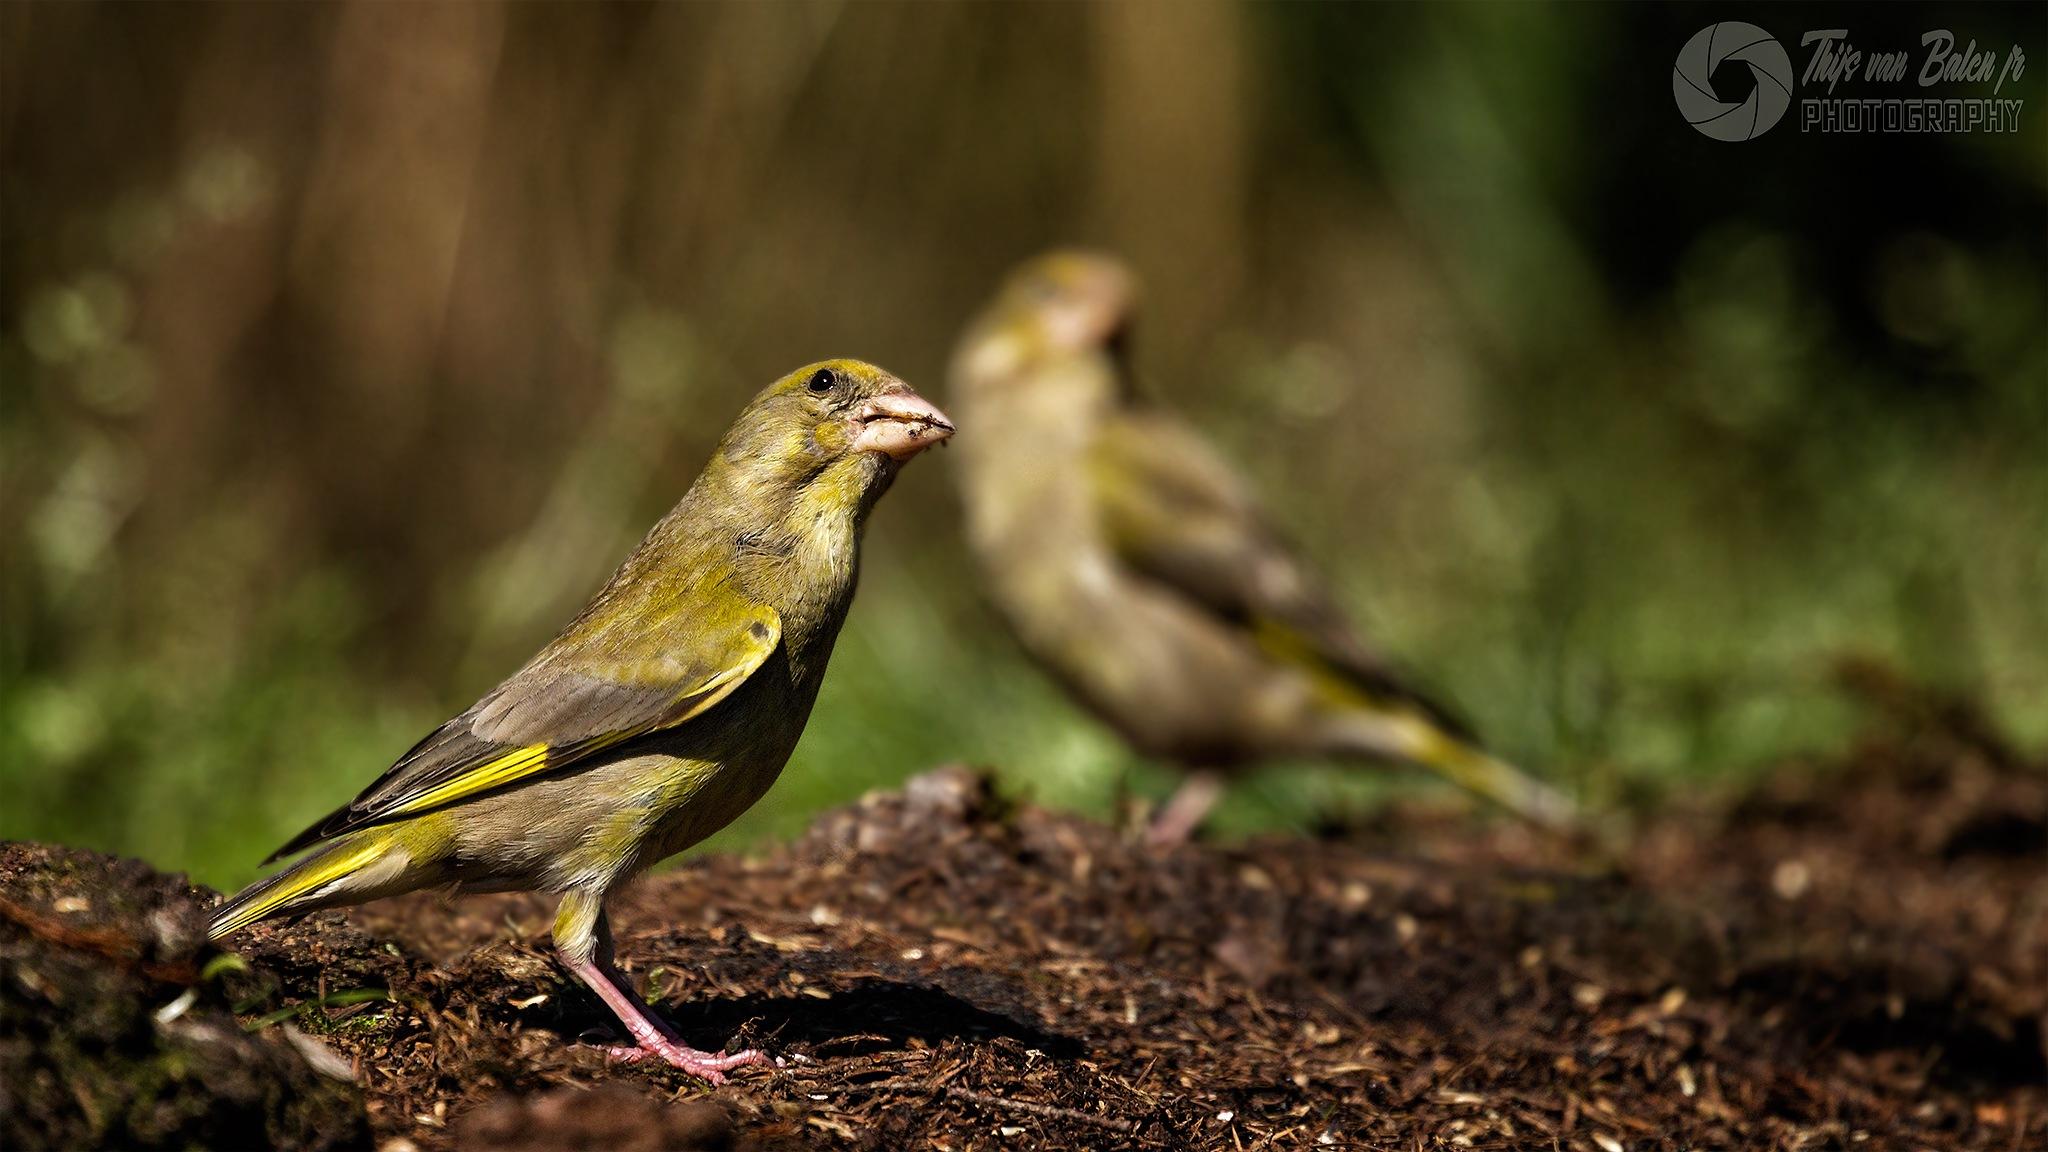 European greenfinch (Chloris chloris) by Thijs van Balen Jr